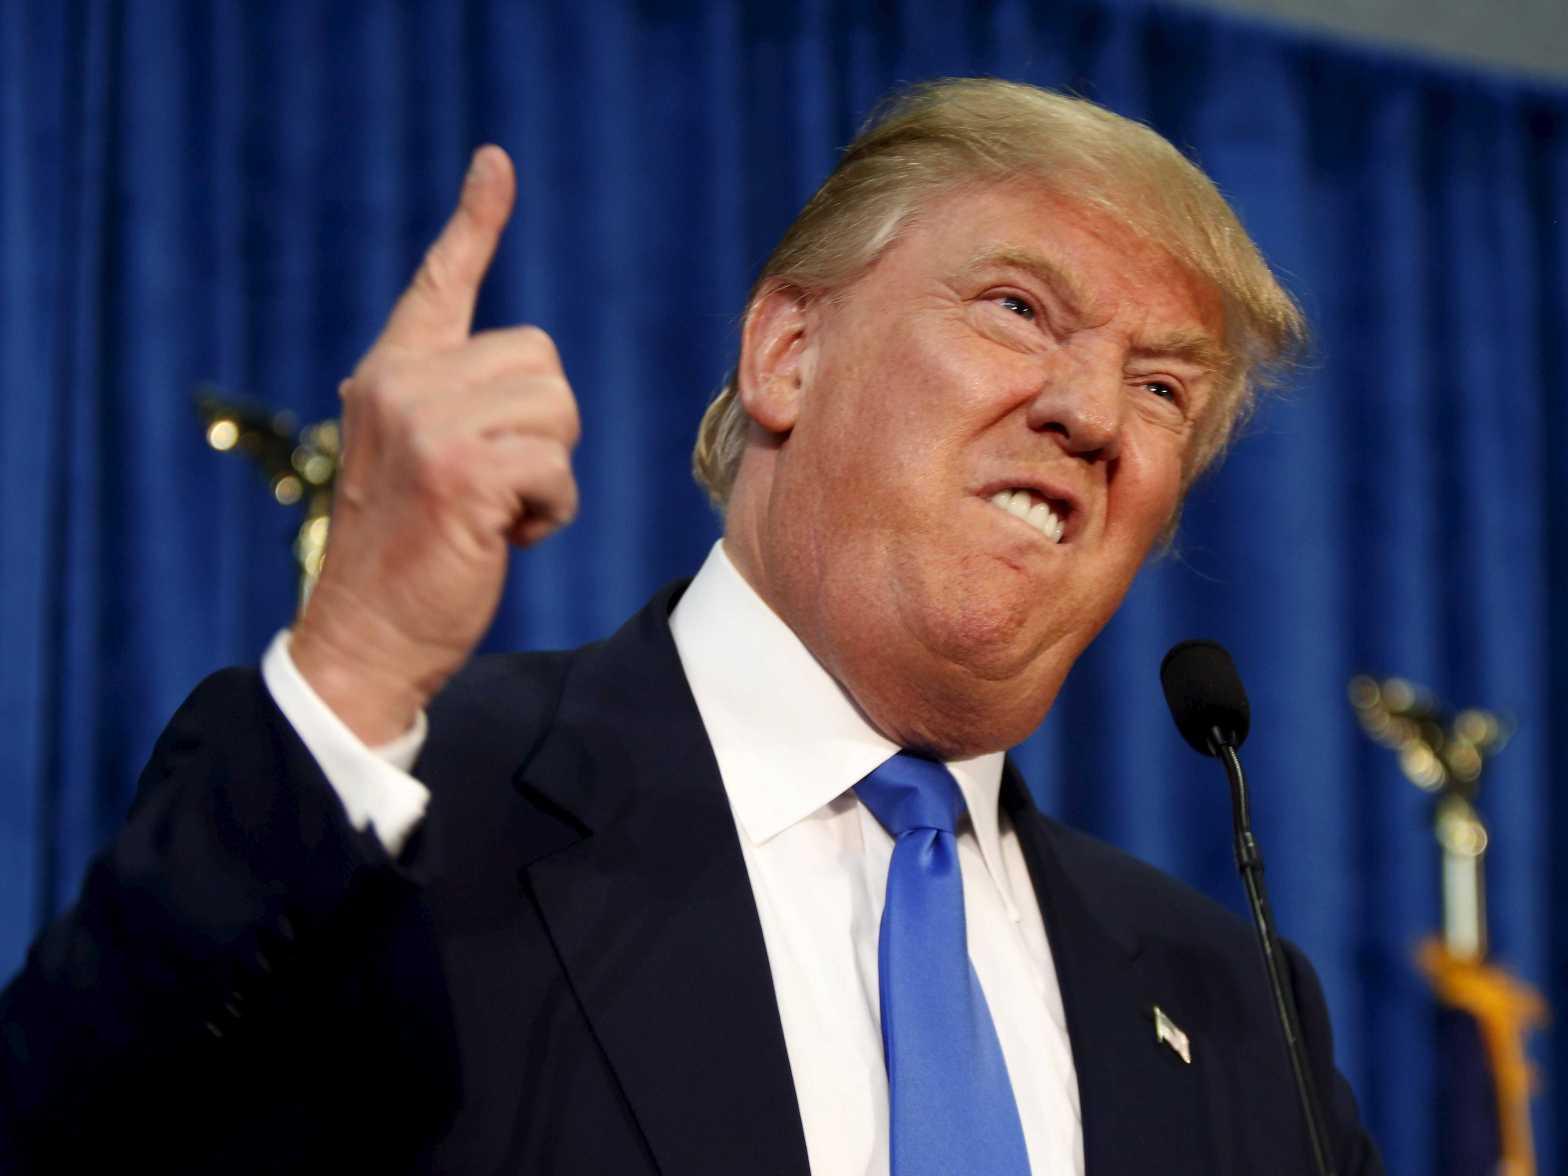 Donald trump hatred anger election blog post